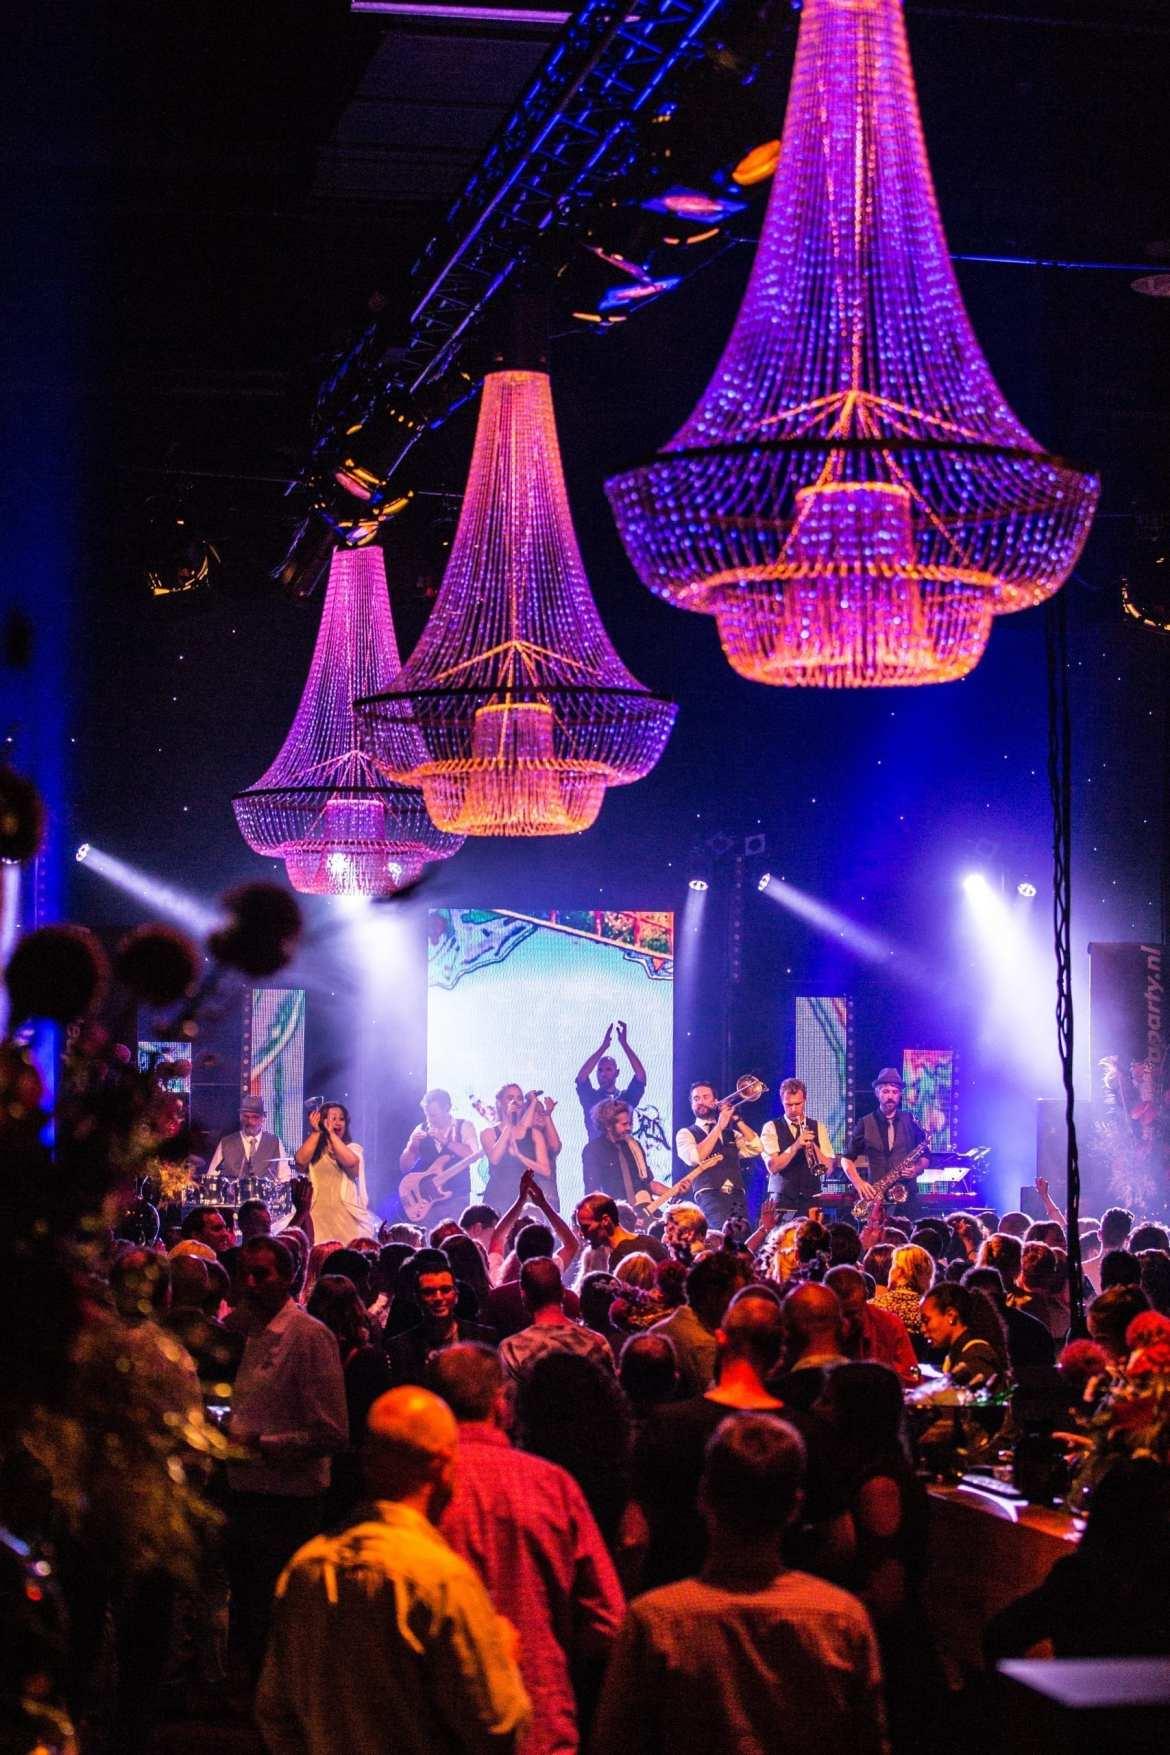 Feest Rabobank samen met Jeroen van der Boom in Worldhotel Wings te Rotterdam feestband.com